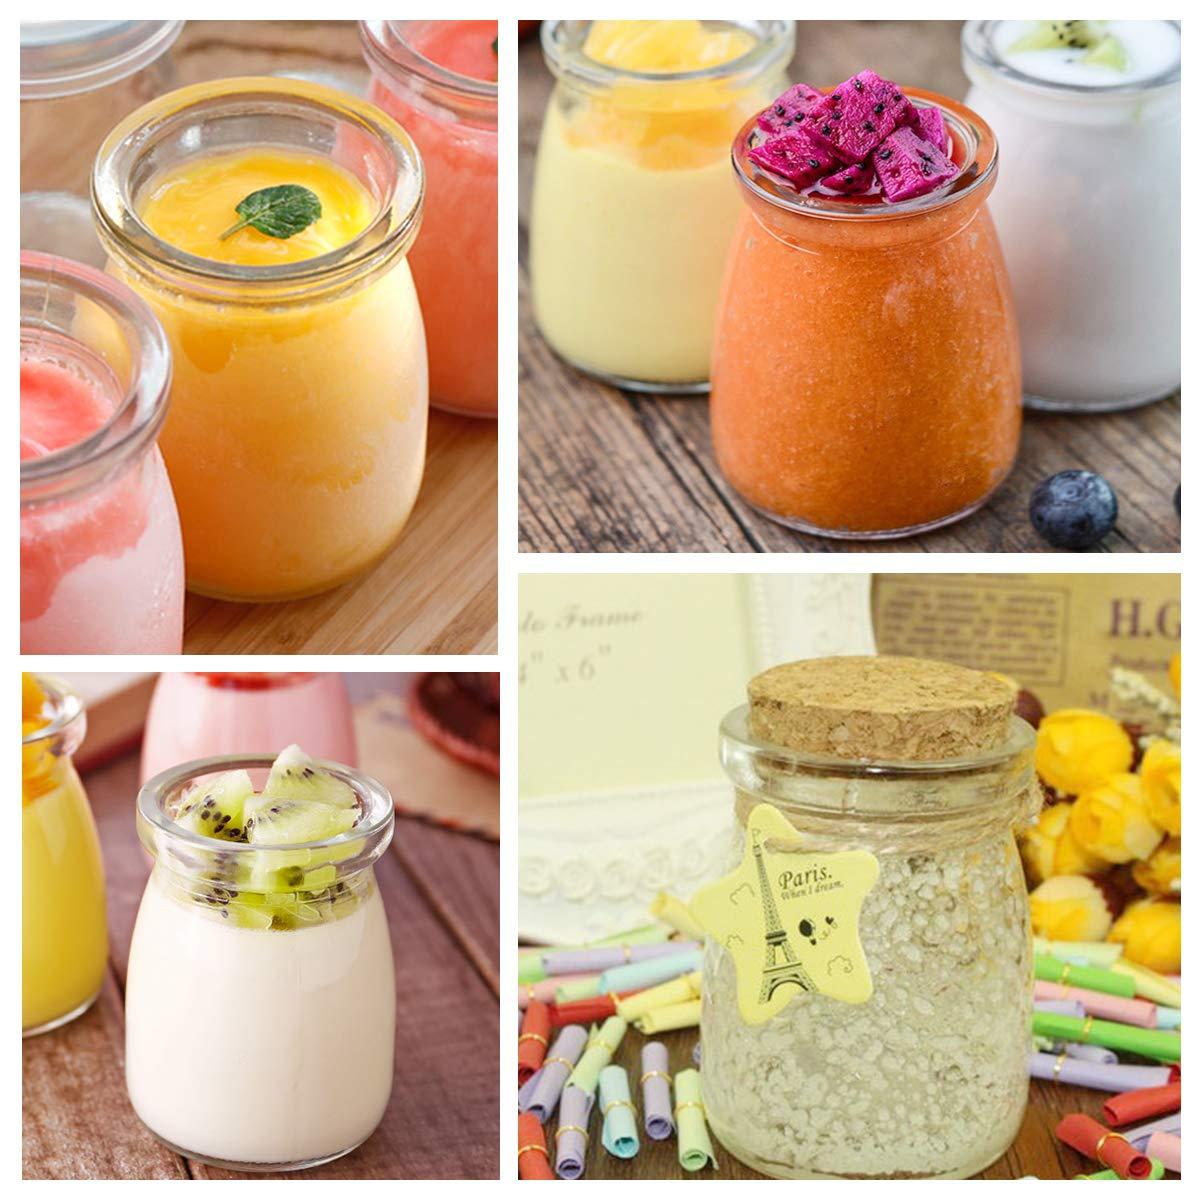 Glass Jars, KAMOTA 40 PACK 4oz Clear Yogurt Jars With PE Lids, Glass Pudding Jars Yogurt Jars Ideal for Jam, Honey, Wedding Favors, Shower Favors, Baby Foods (150ml) by KAMOTA (Image #6)